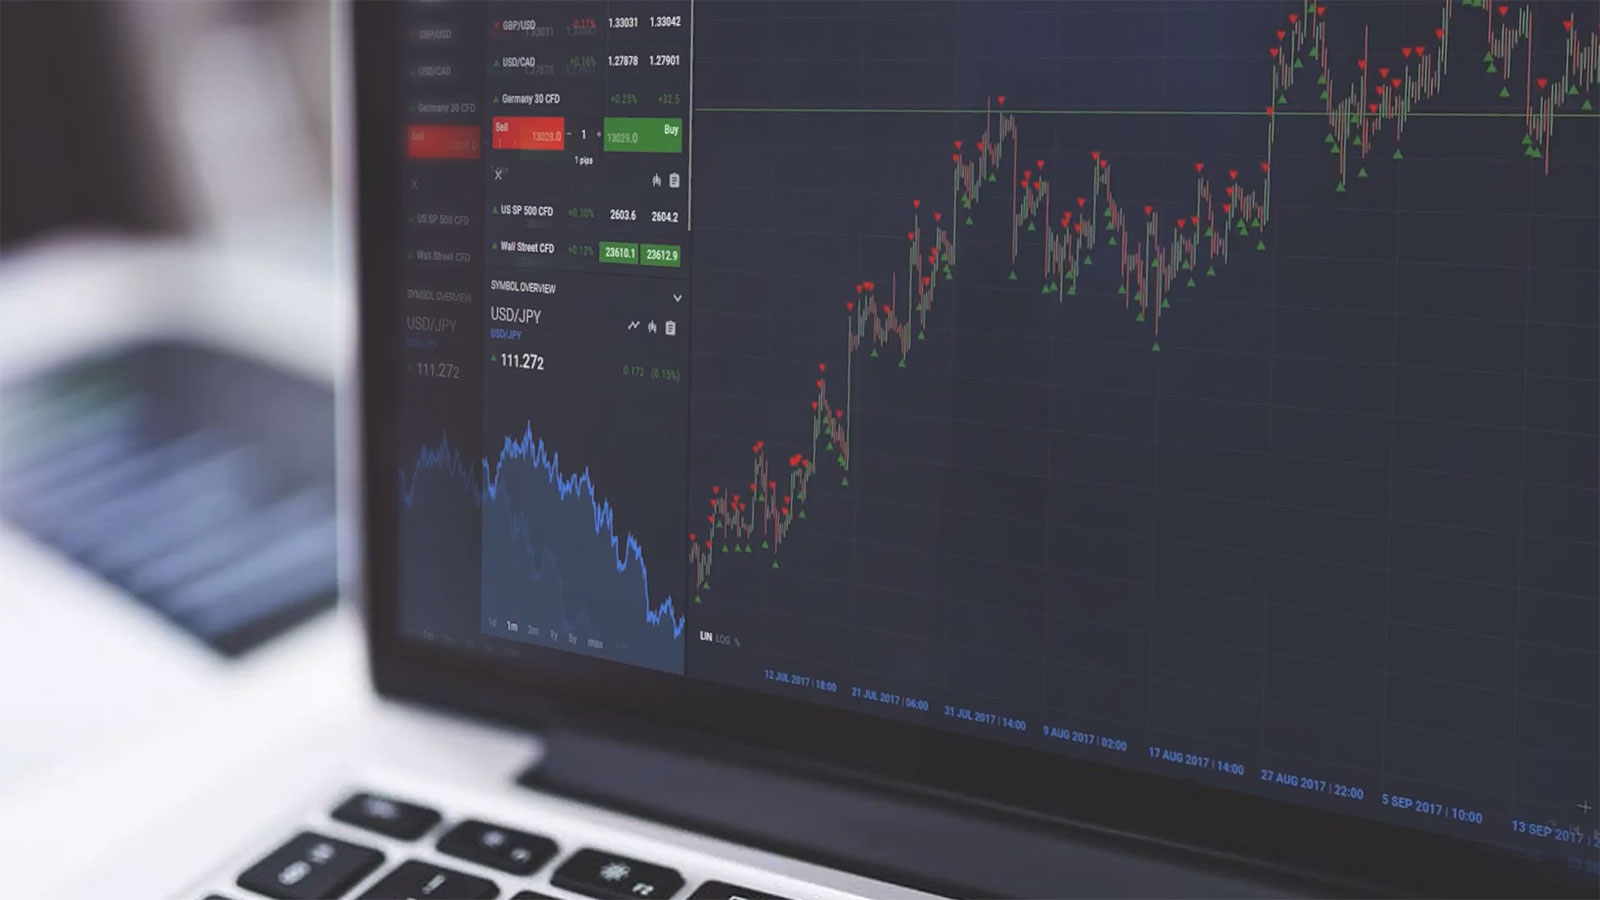 platforma transakcyjna Exeria, notowania walut, indeksów, kryptowalut, Bitcoin